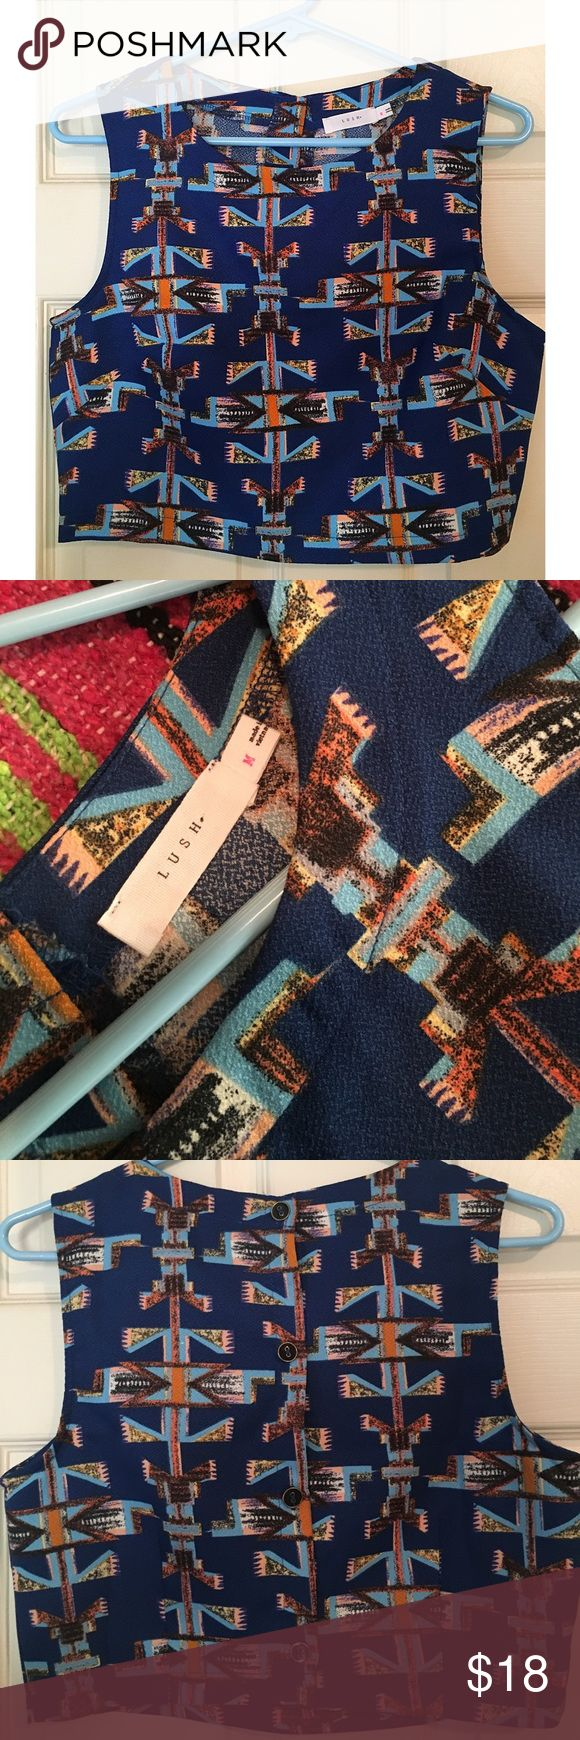 Aztec Crop Top NWOT Aztec print crop top- never worn! Purchased from Nordstrom- button back Lush Tops Crop Tops